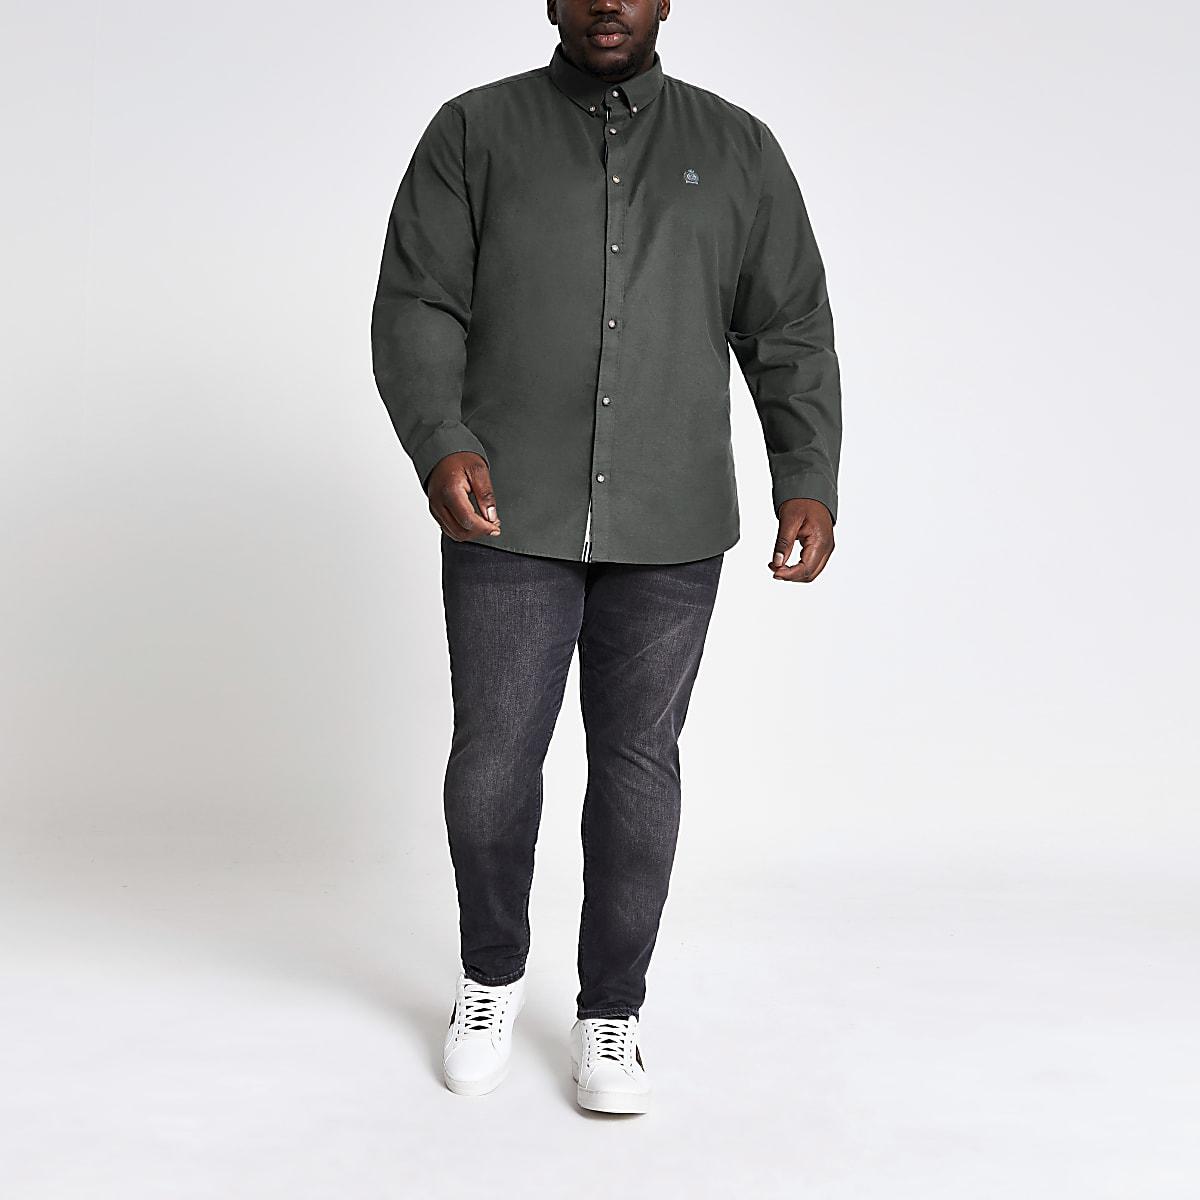 Big and Tall khaki long sleeve Oxford shirt